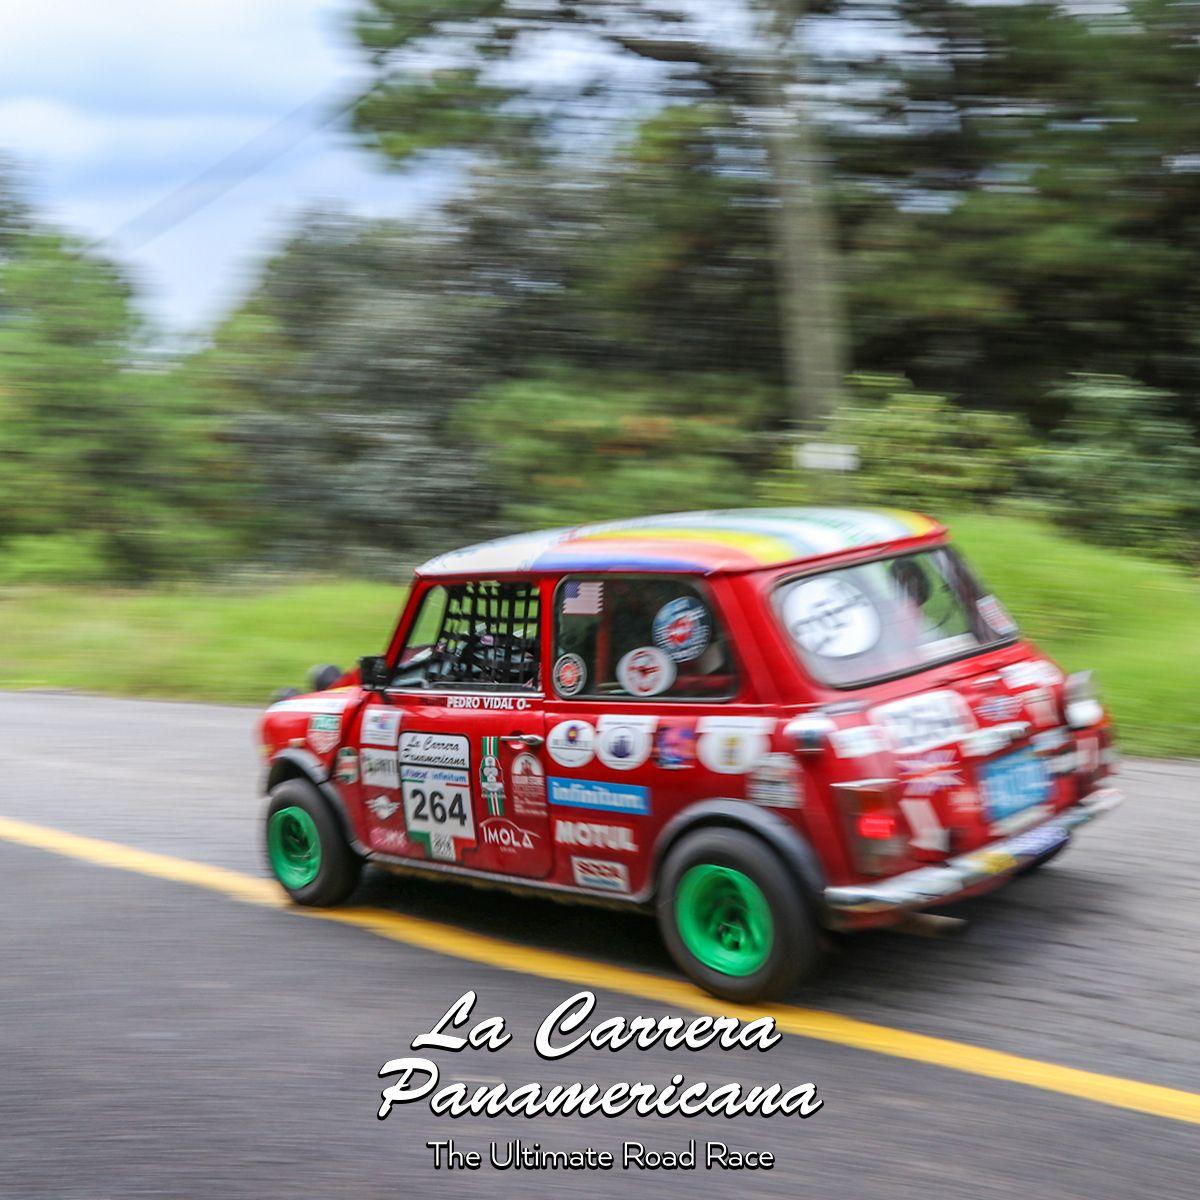 Carrera Panamericana's photo on #F1xFOX